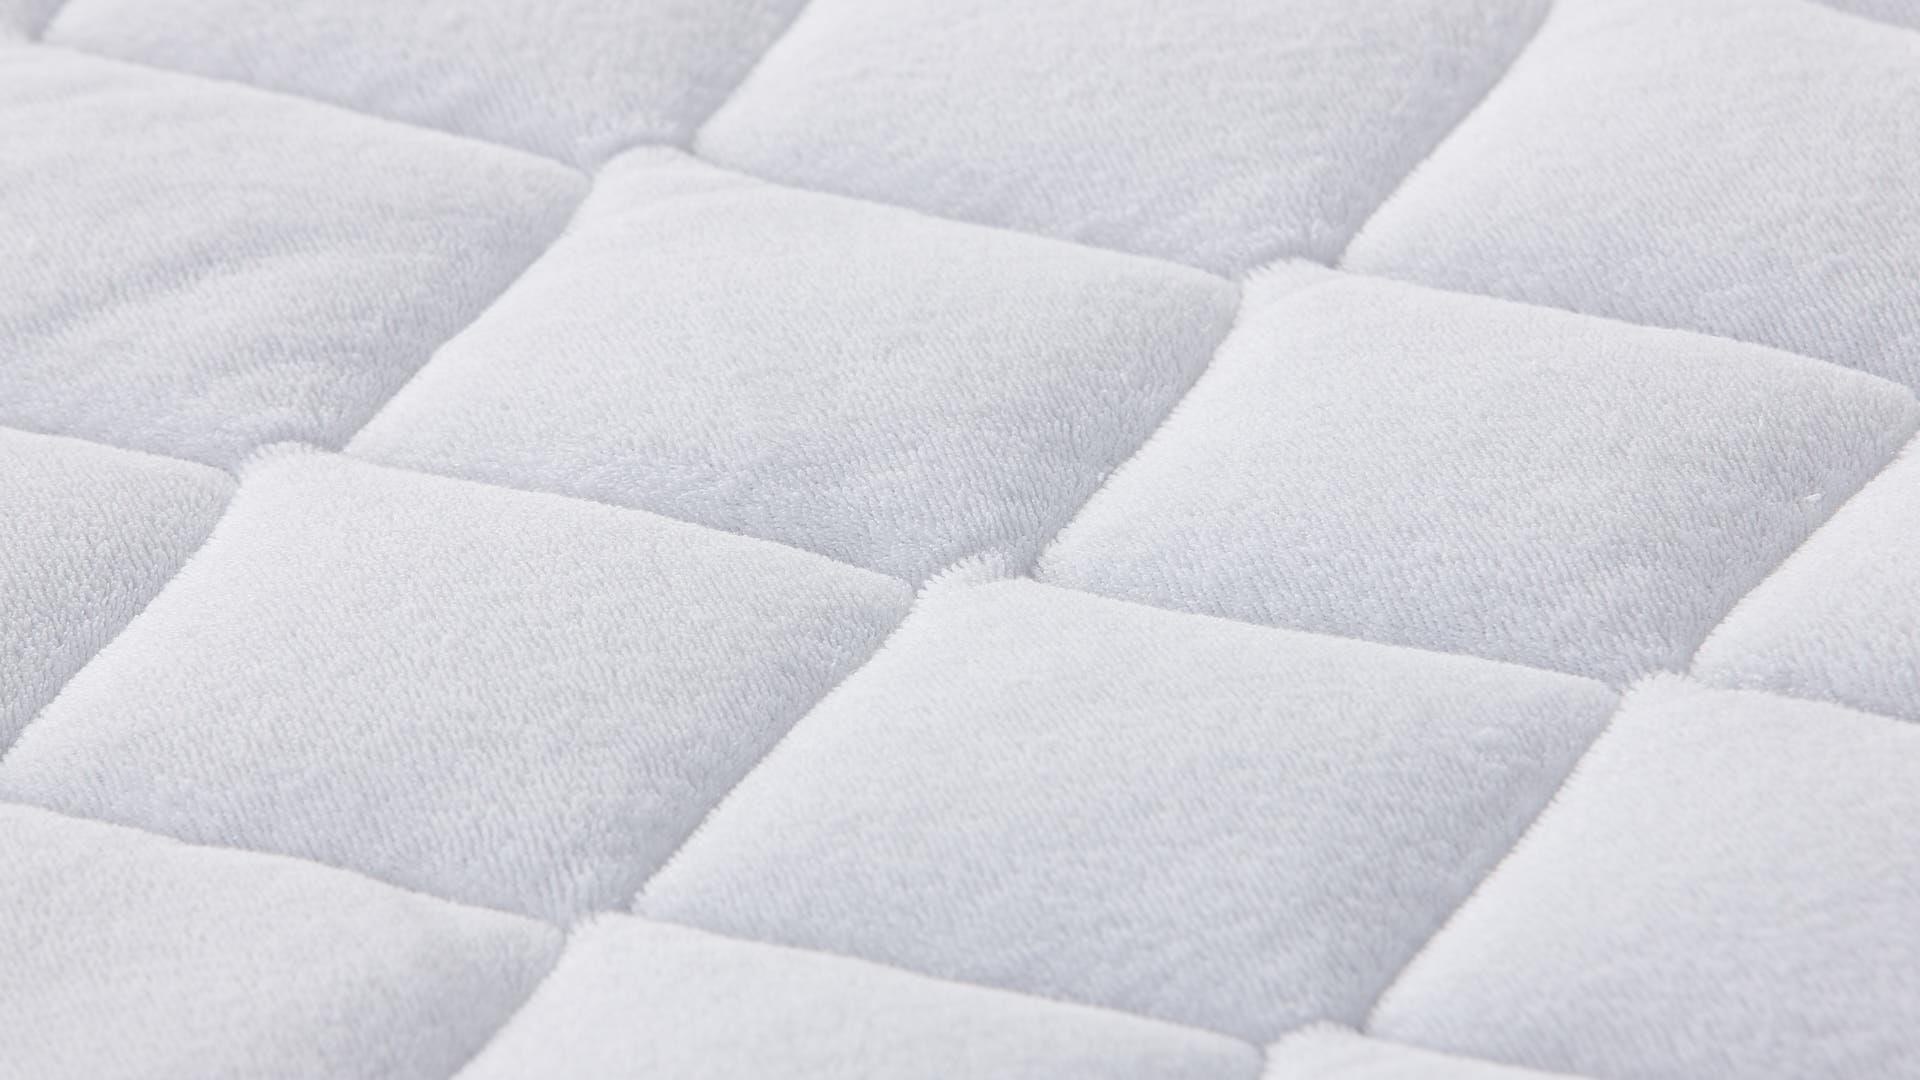 Wash-Cotton Stretch-Matratzenbezug close-up